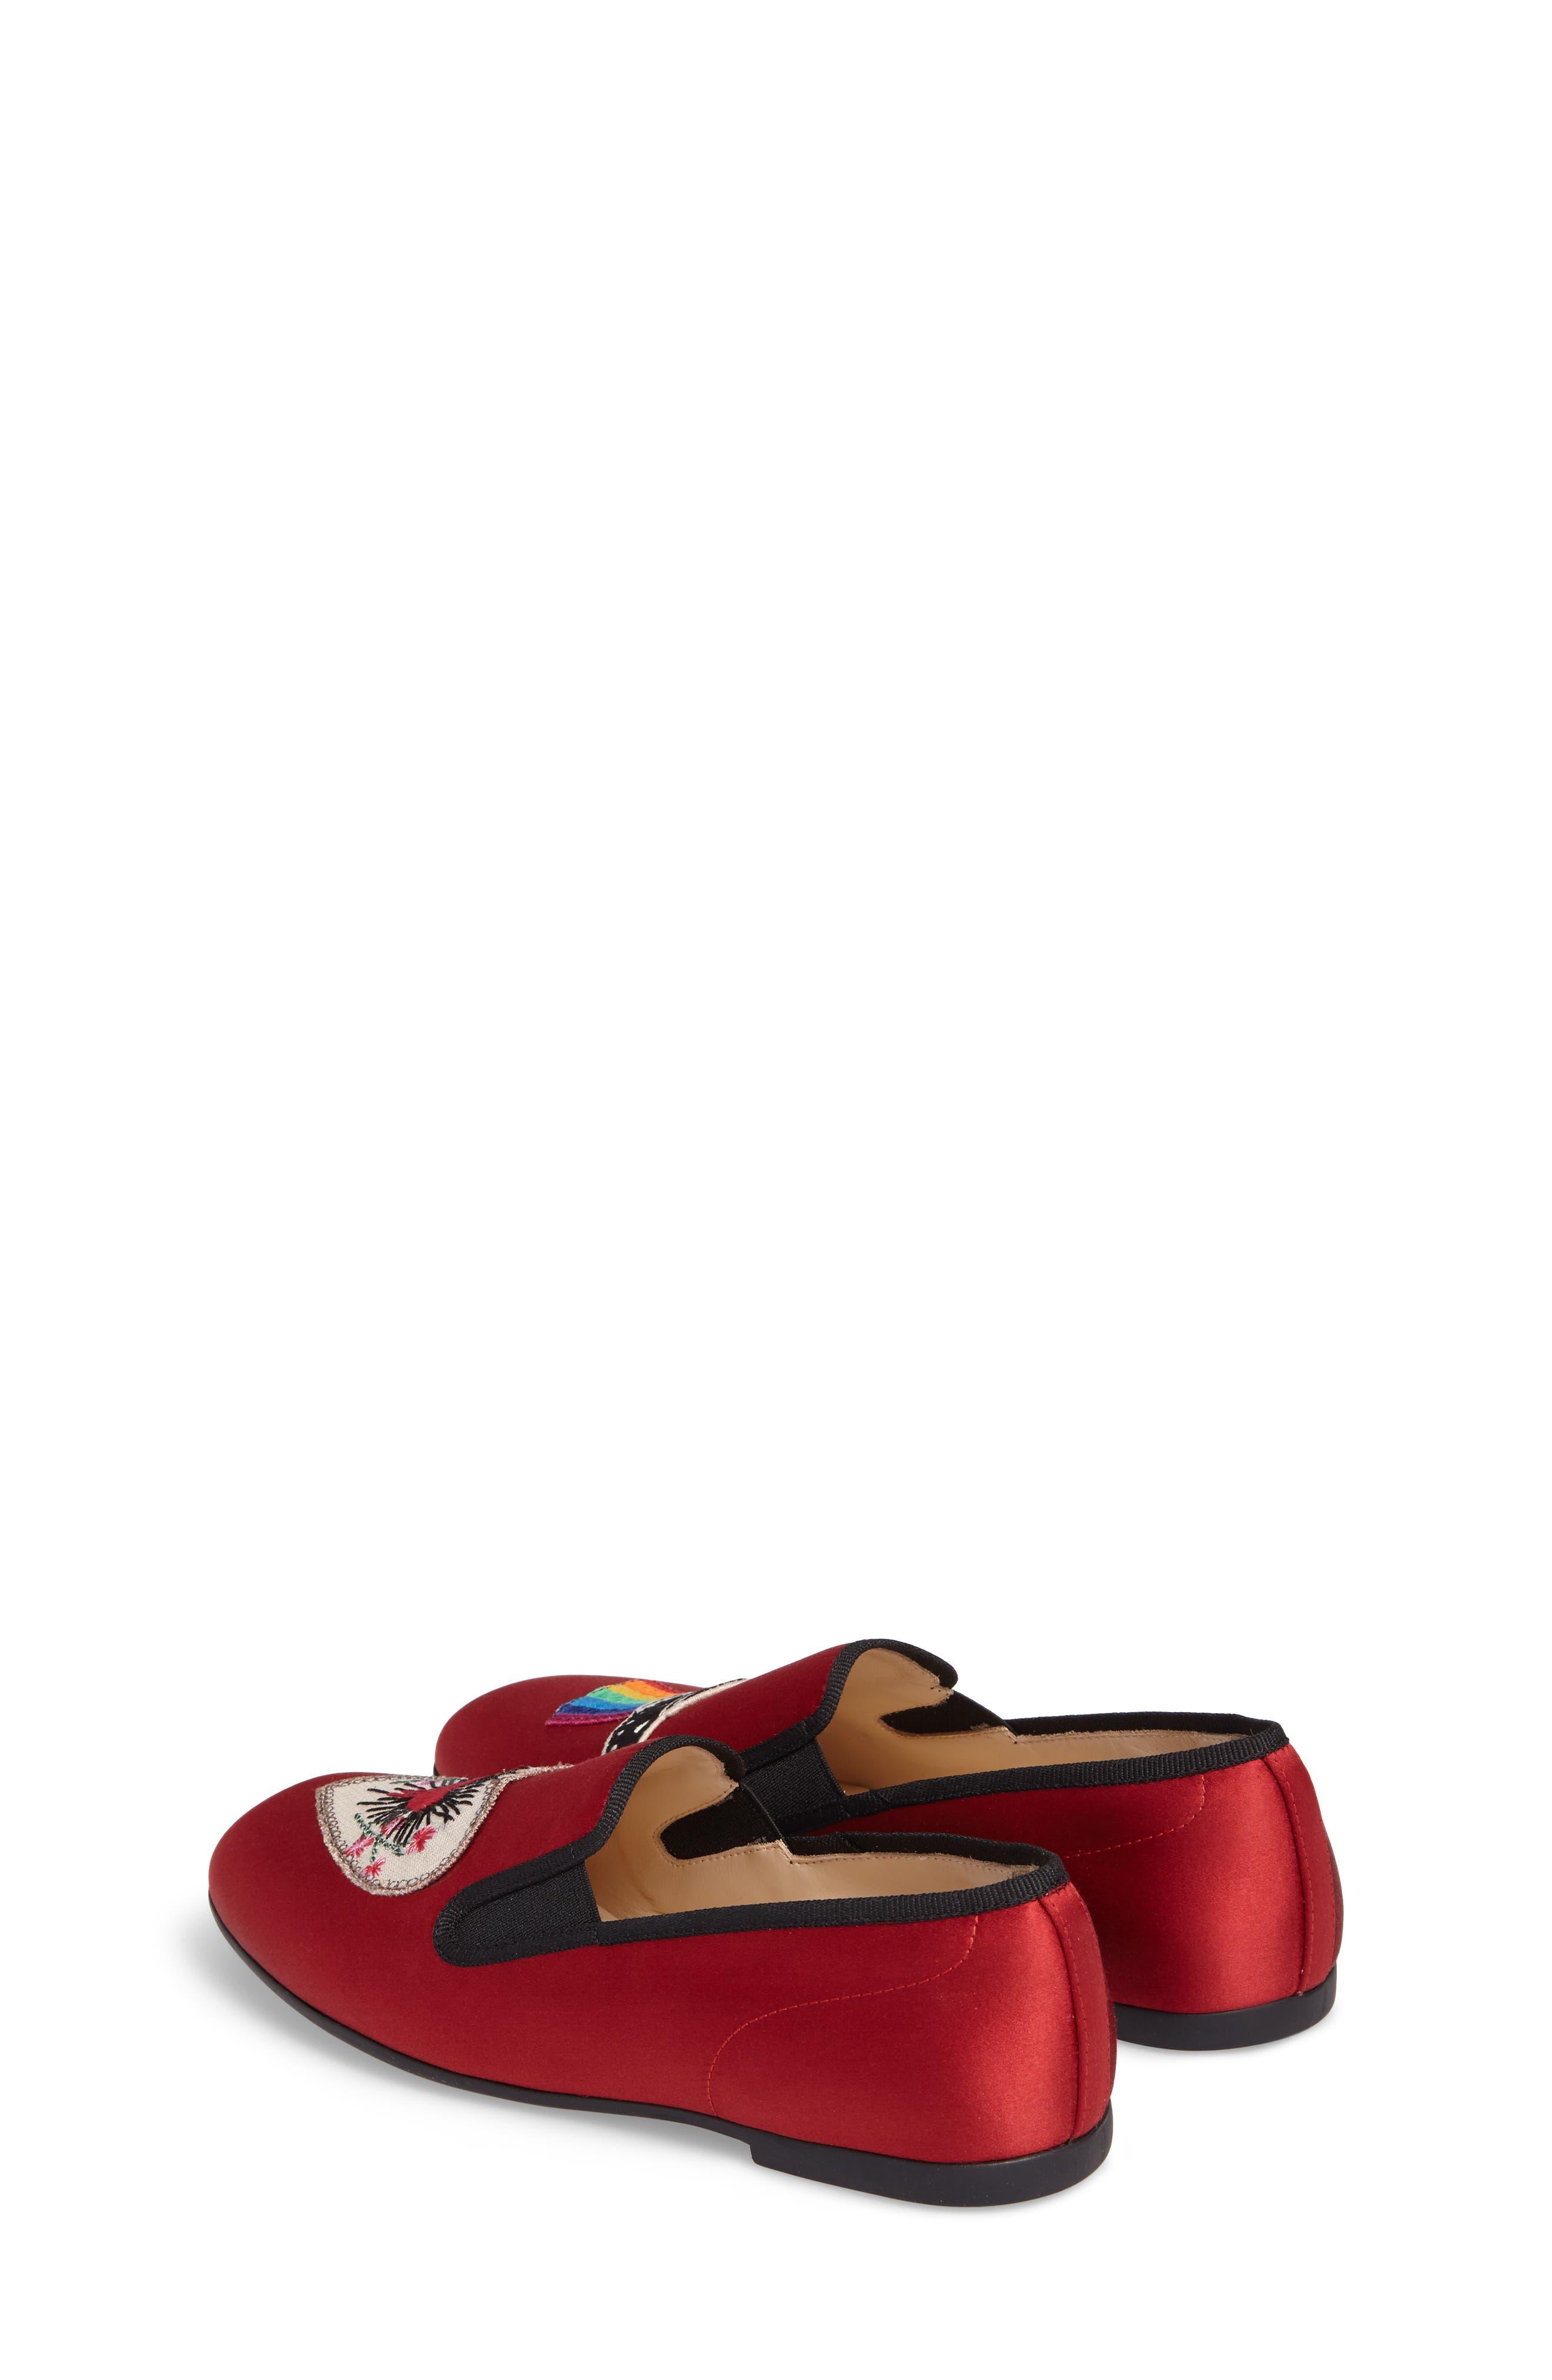 Nannie Appliqué Loafer Flat,                             Alternate thumbnail 2, color,                             Red